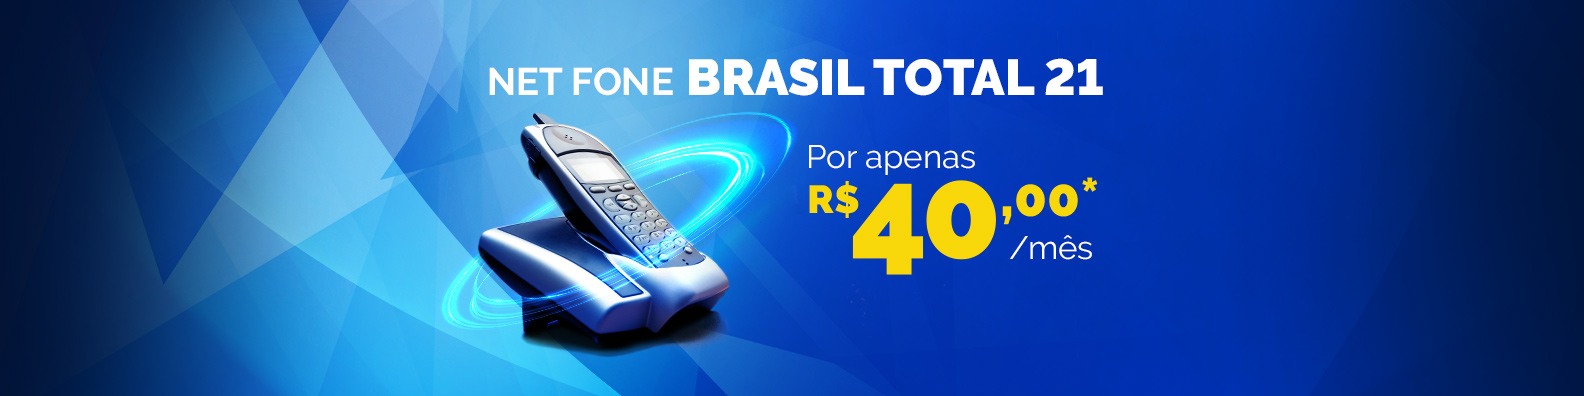 net fone brasil total 21 por apenas 40 por mes no combo multi